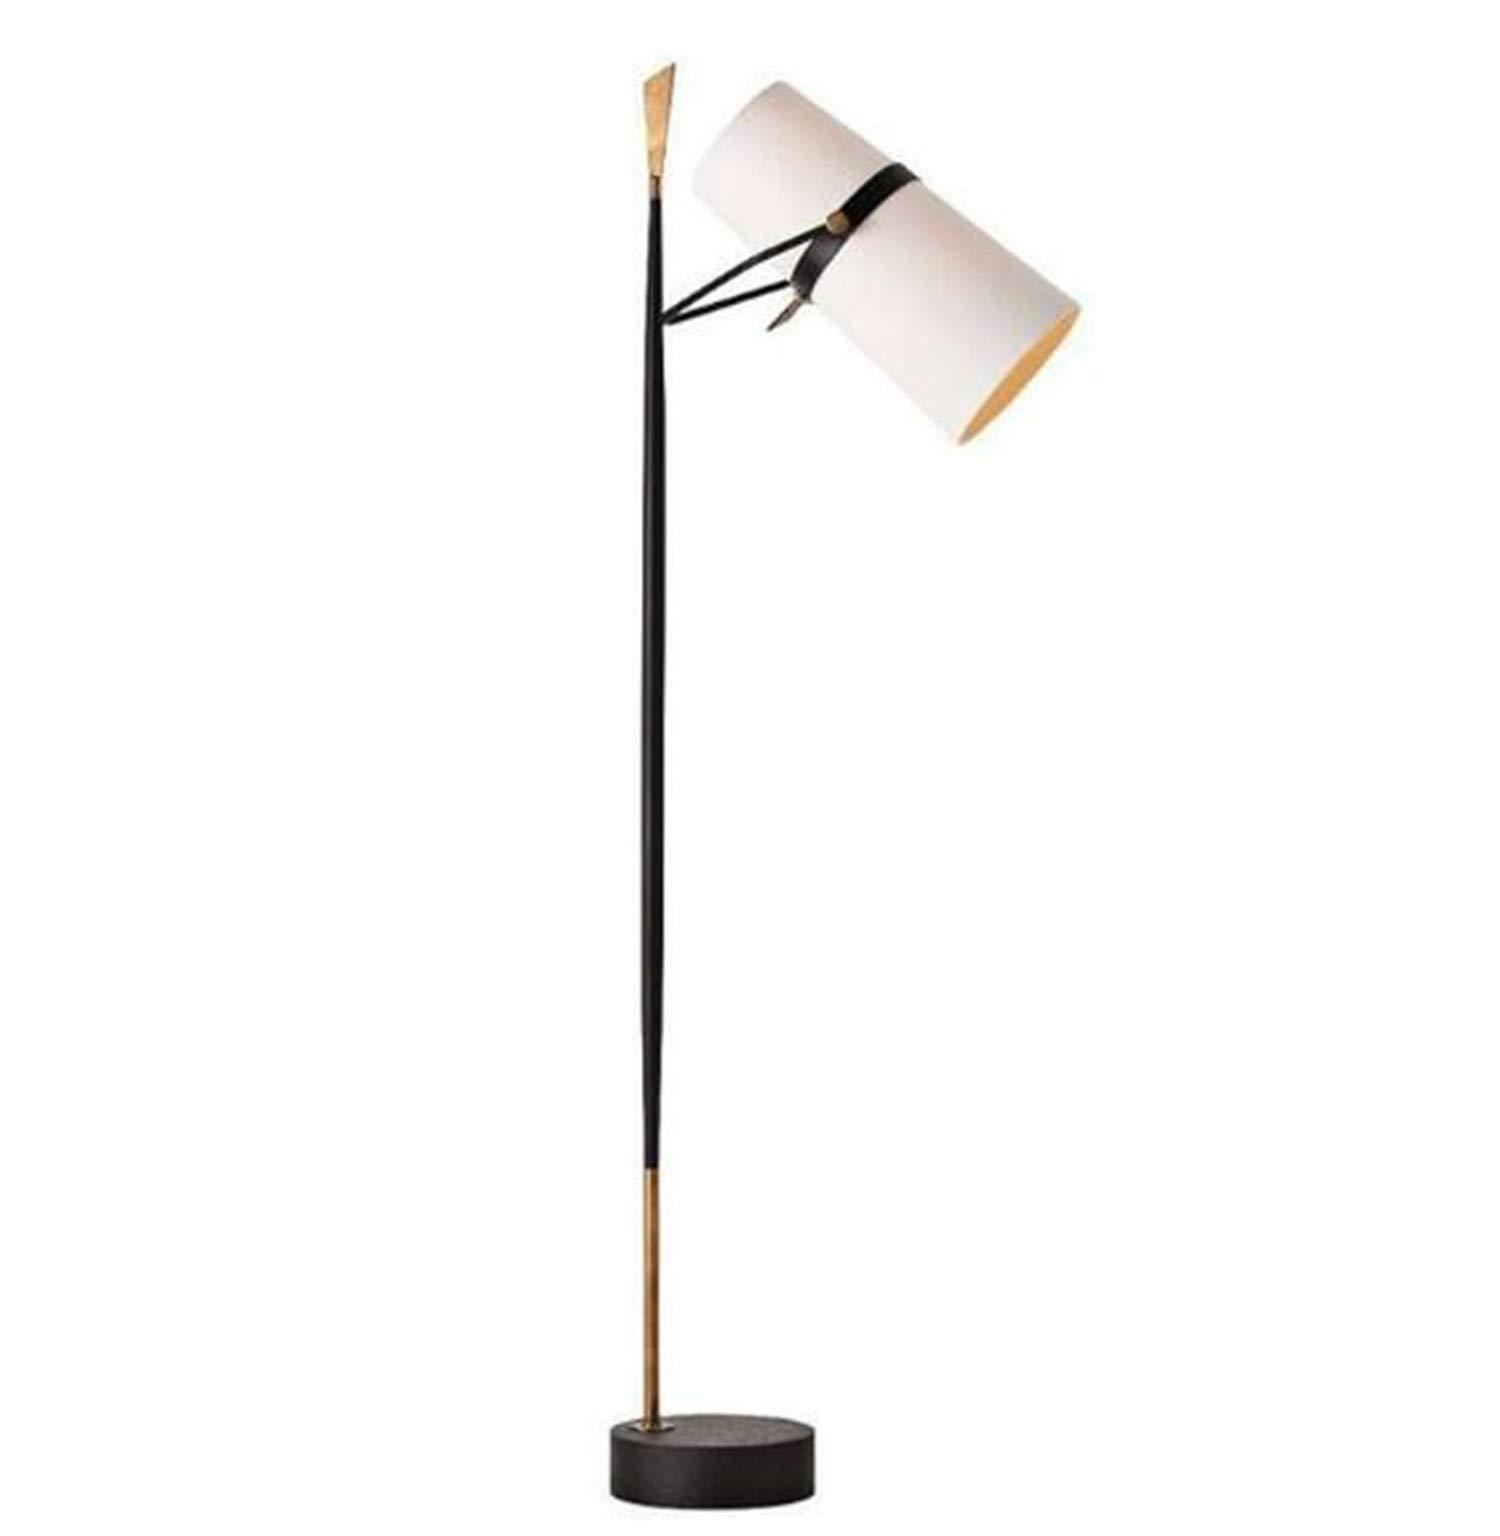 colore: bianco Lampada a stelo in acciaio EGLO TOWNSHEND 10 W